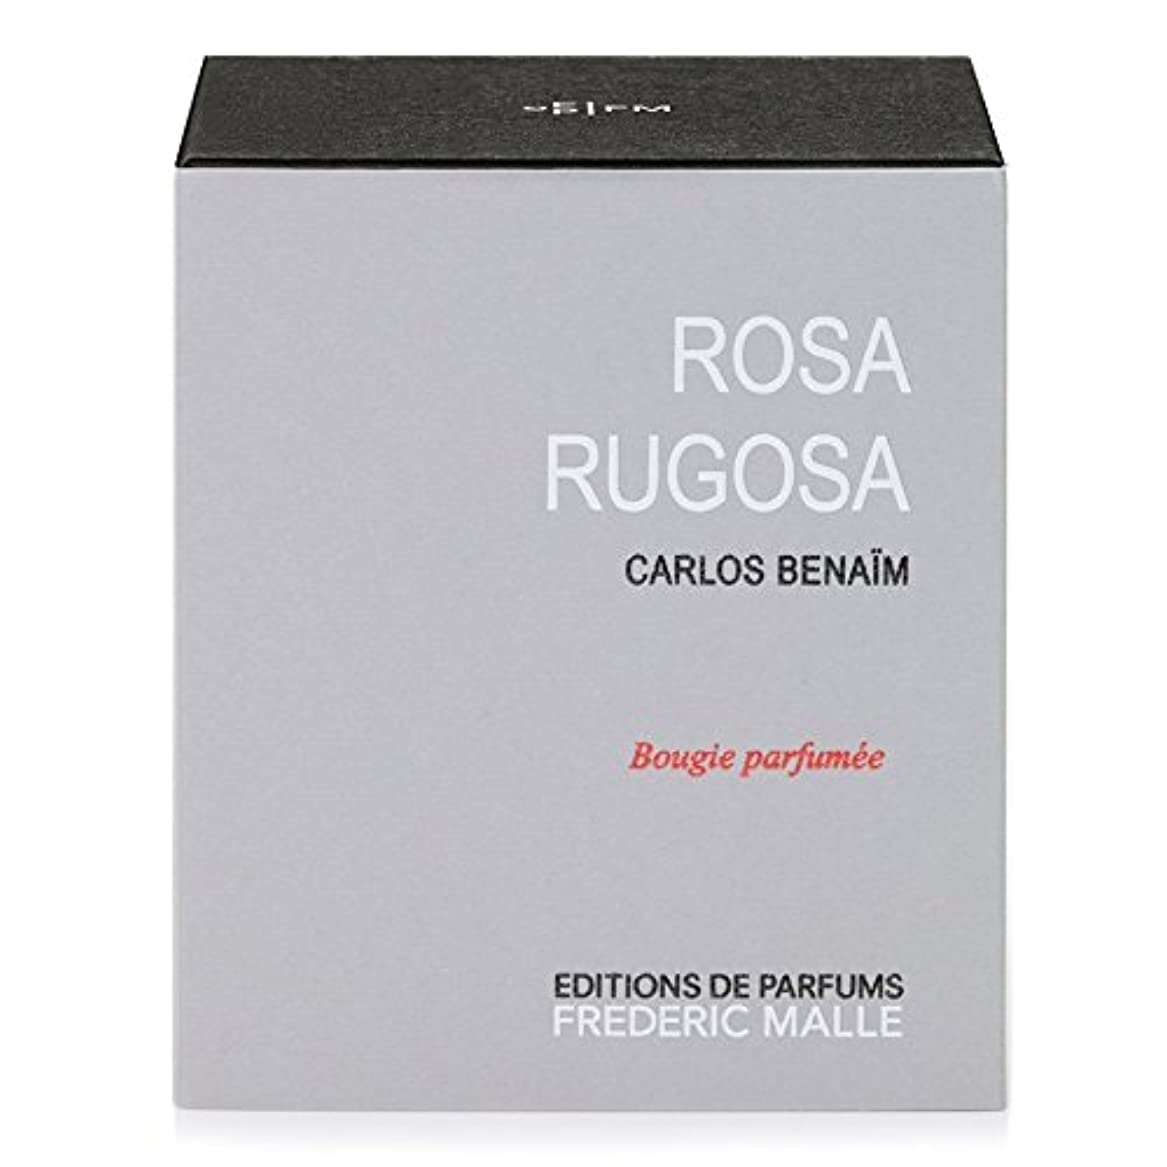 Frederic Malle Rosa Rugosa Scented Candle (Pack of 2) - フレデリック?マルハマナスの香りのキャンドル x2 [並行輸入品]